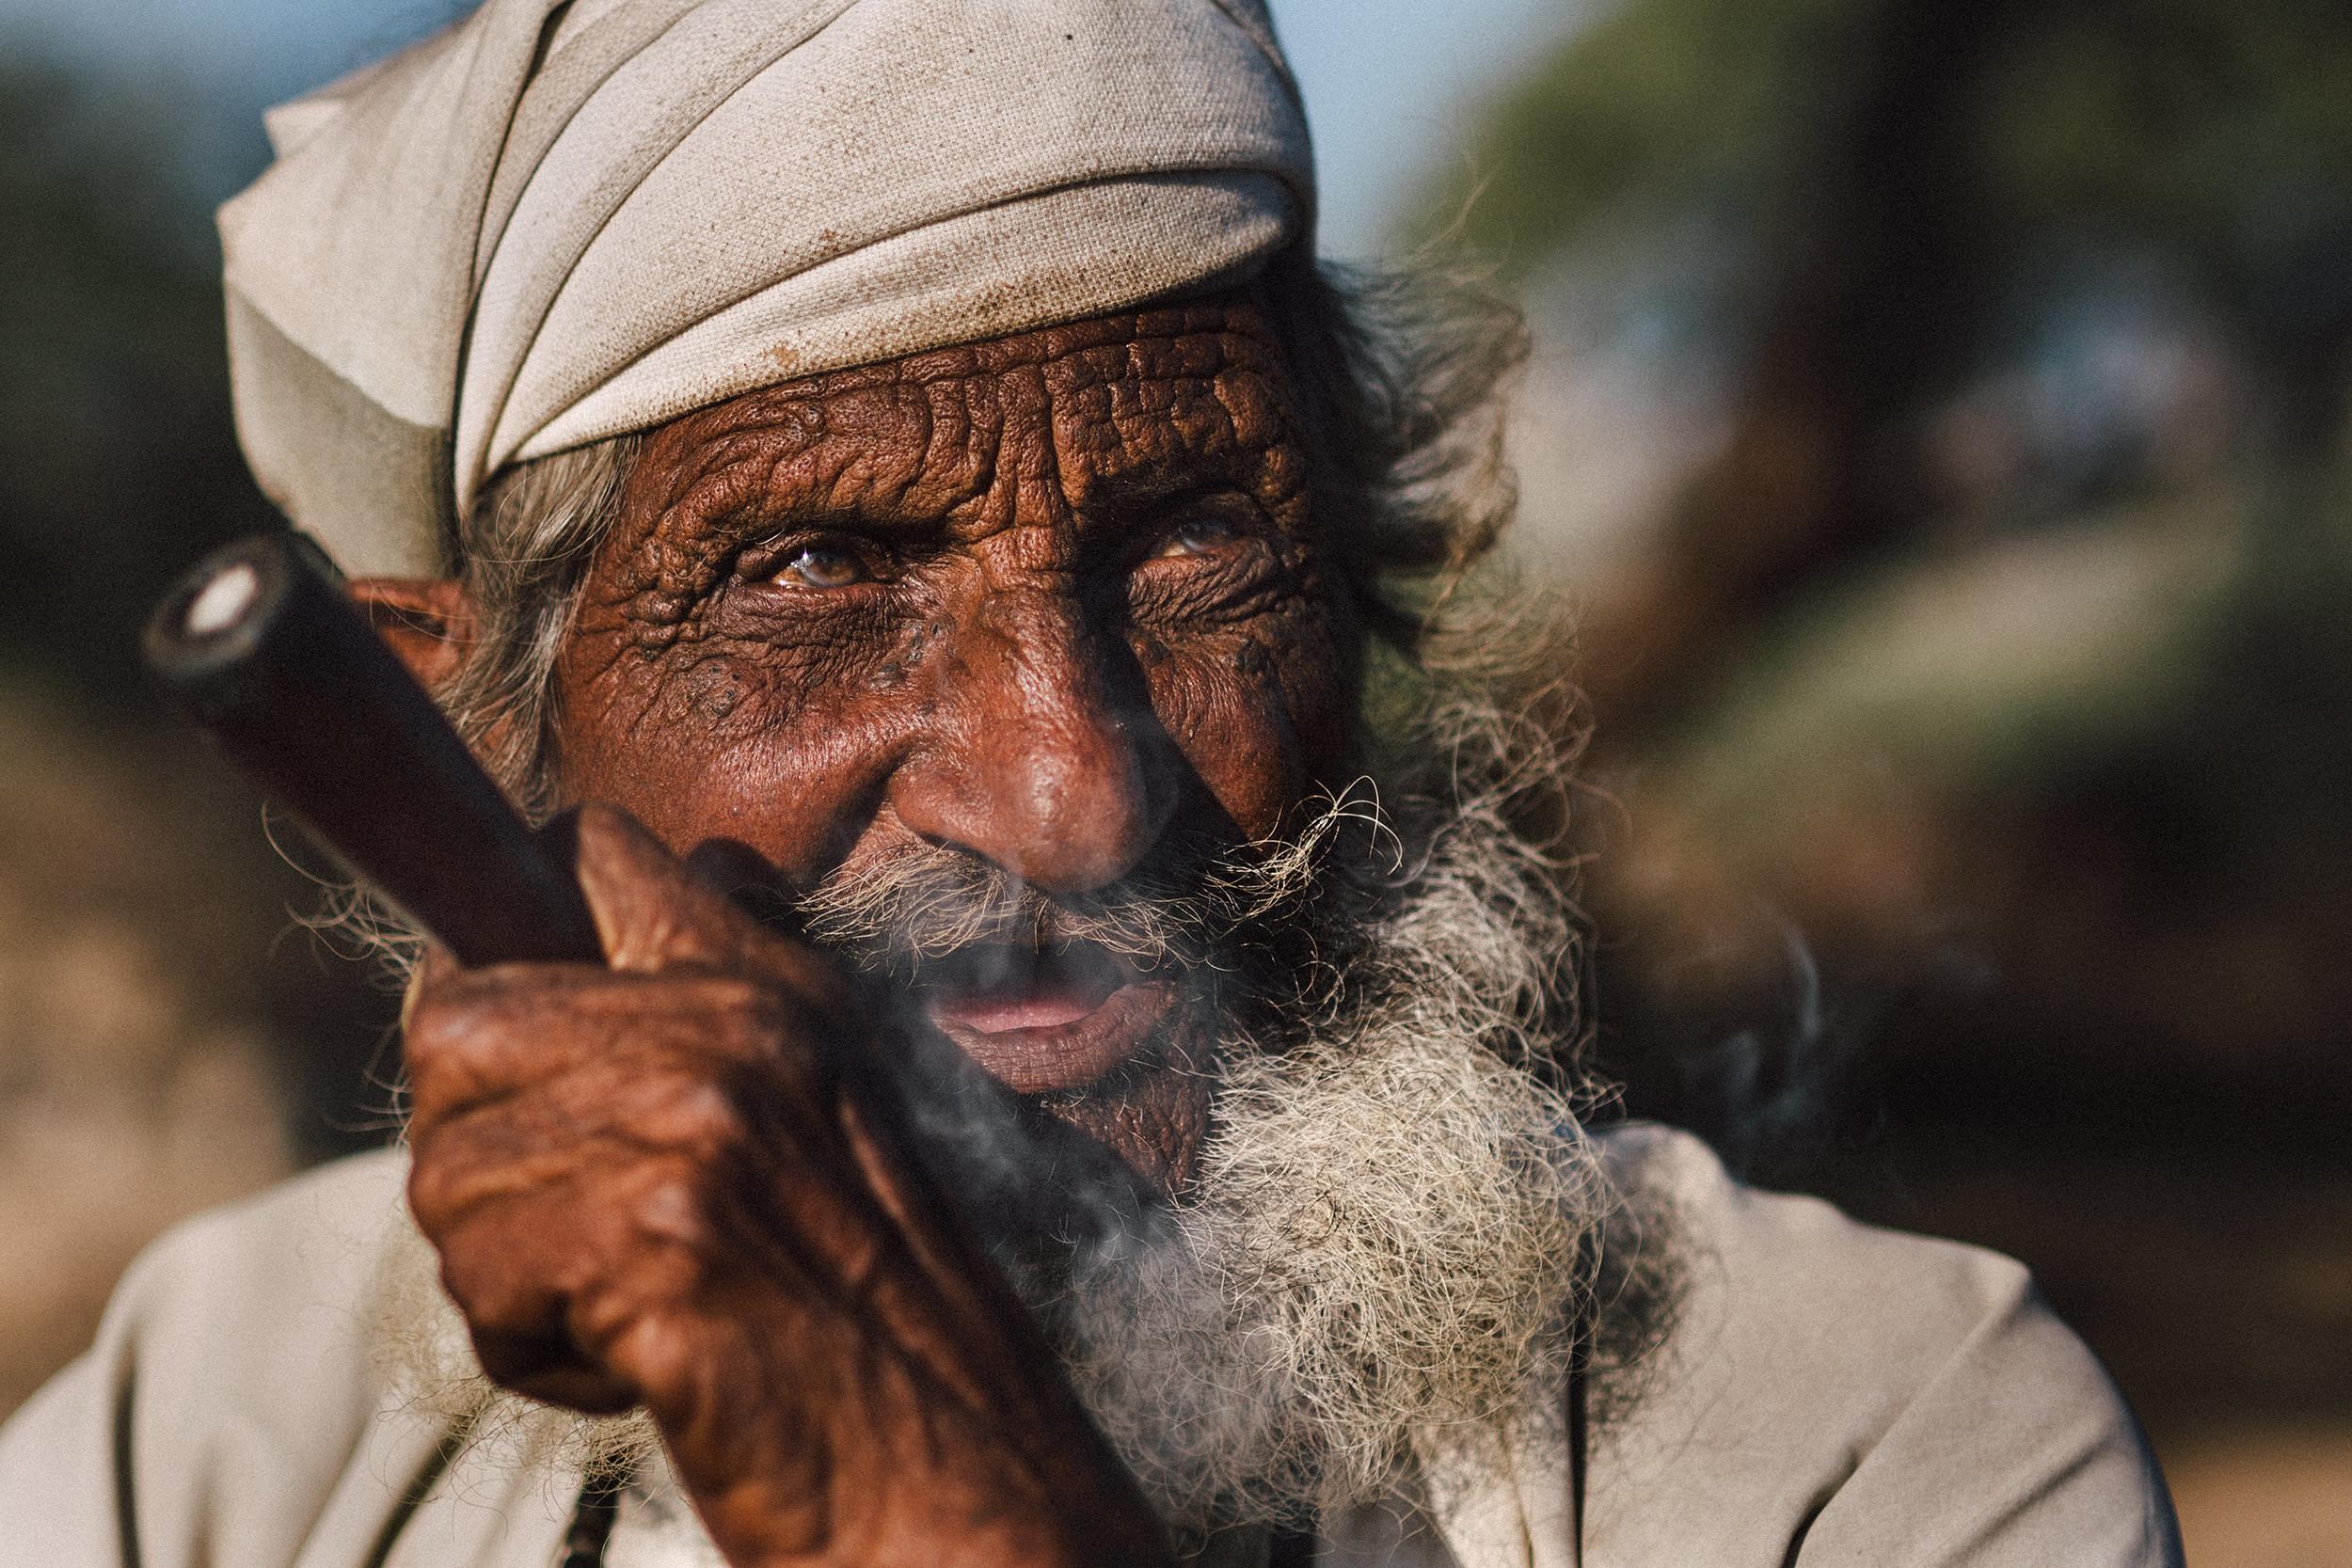 Village elder smoking